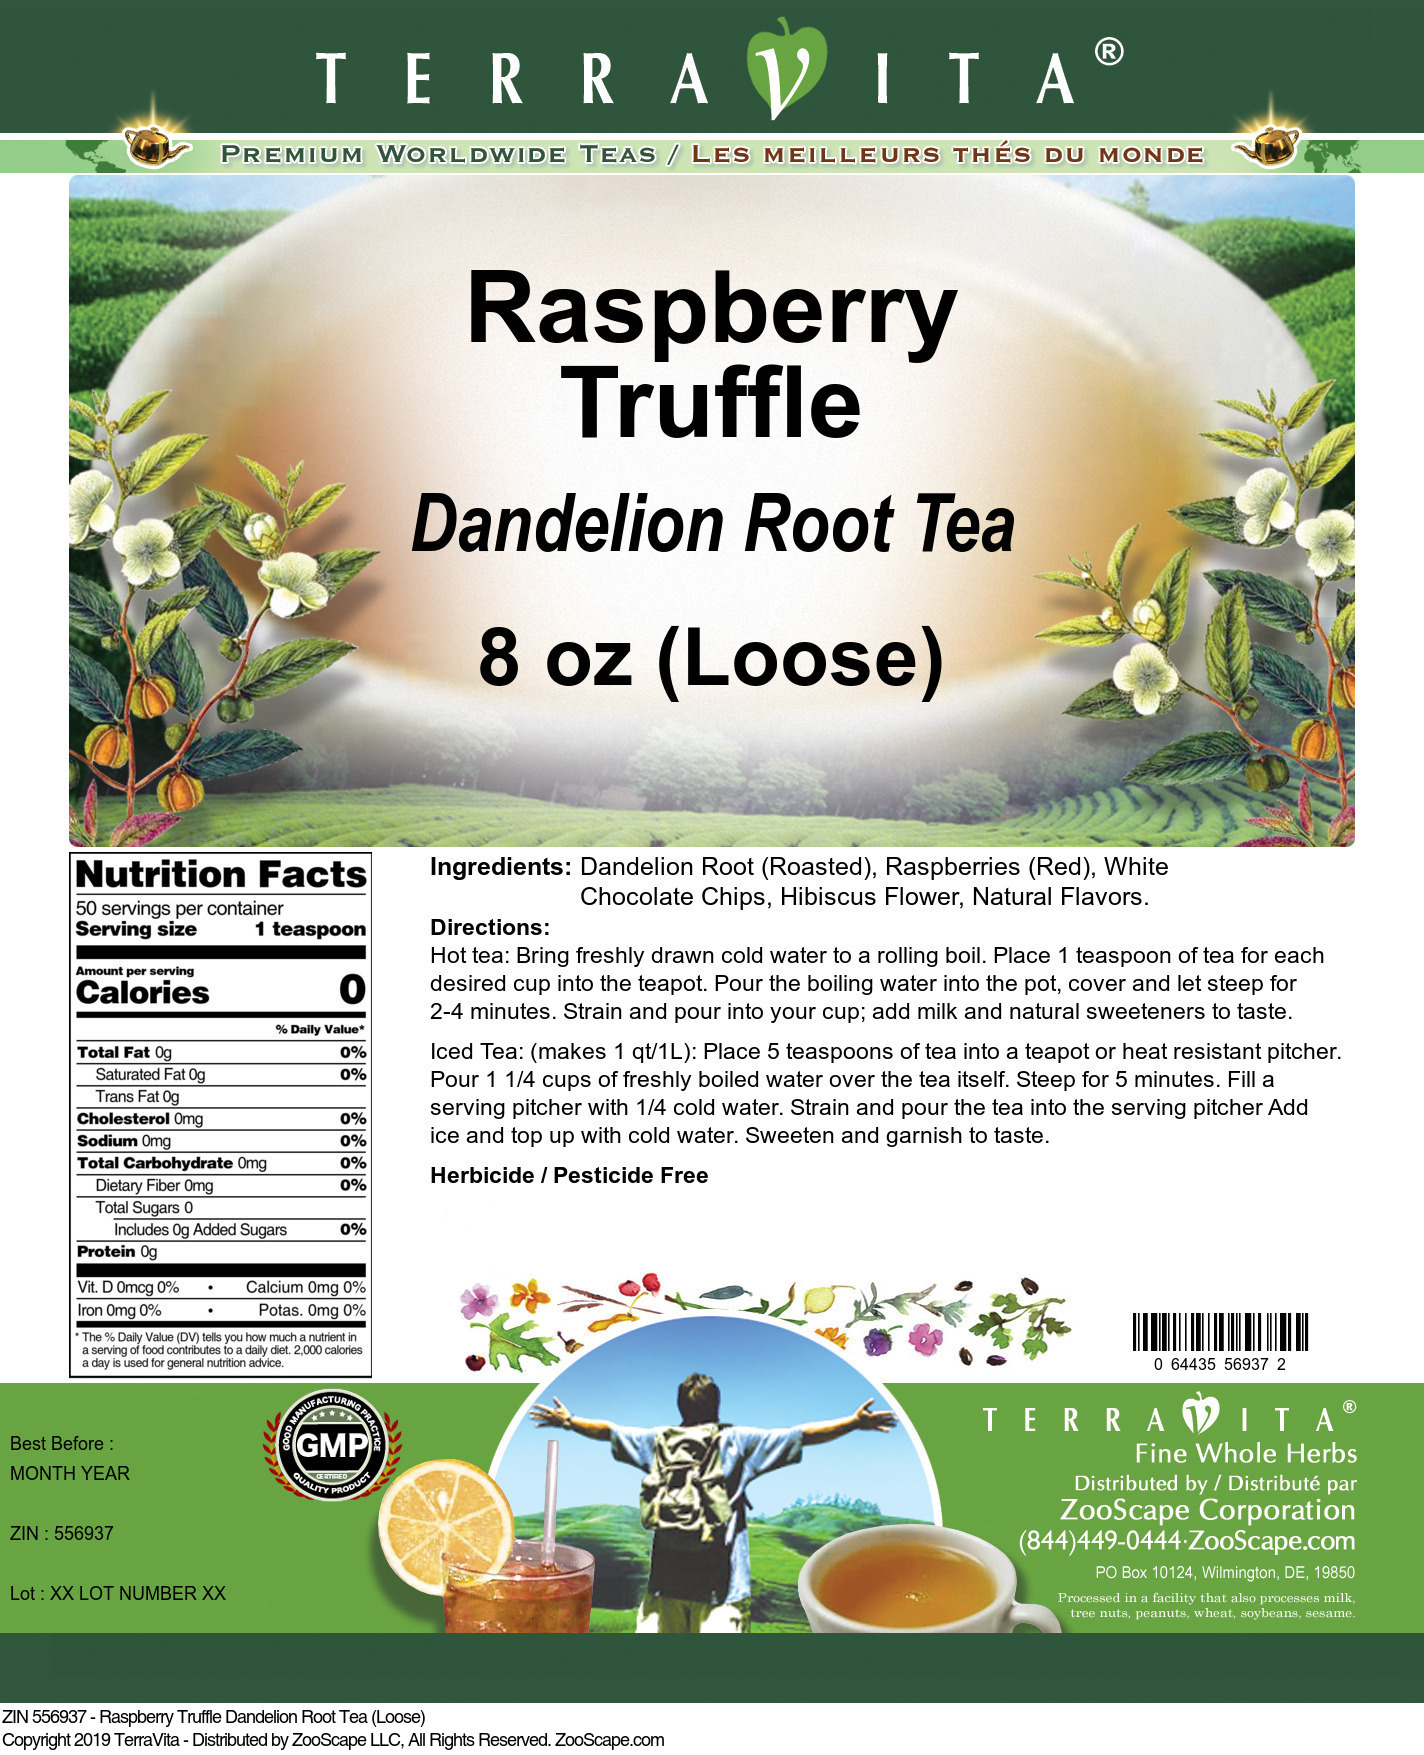 Raspberry Truffle Dandelion Root